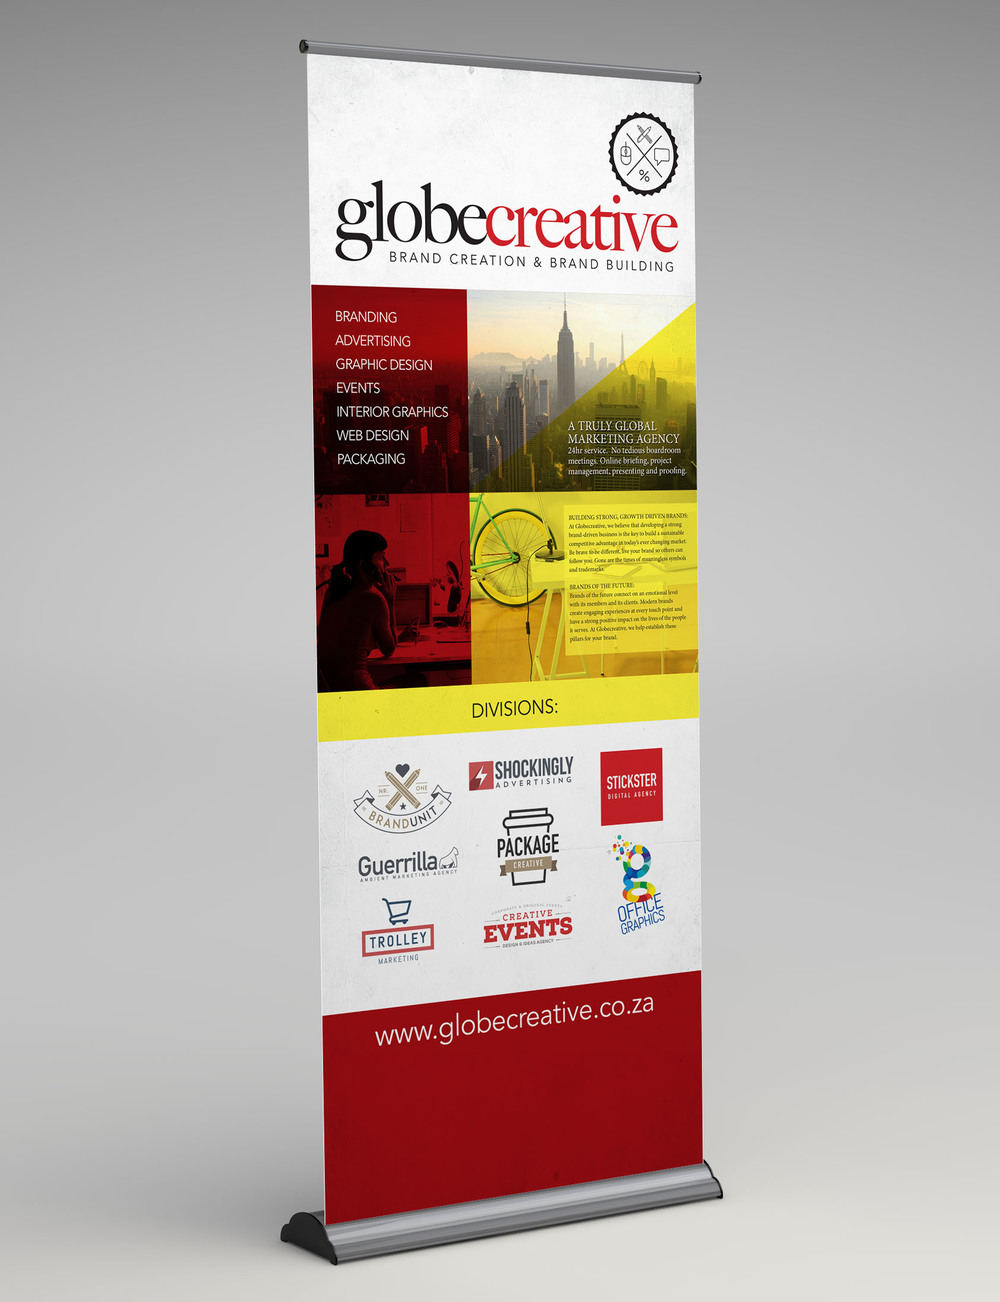 Globecreative banner mockup_crop.jpg